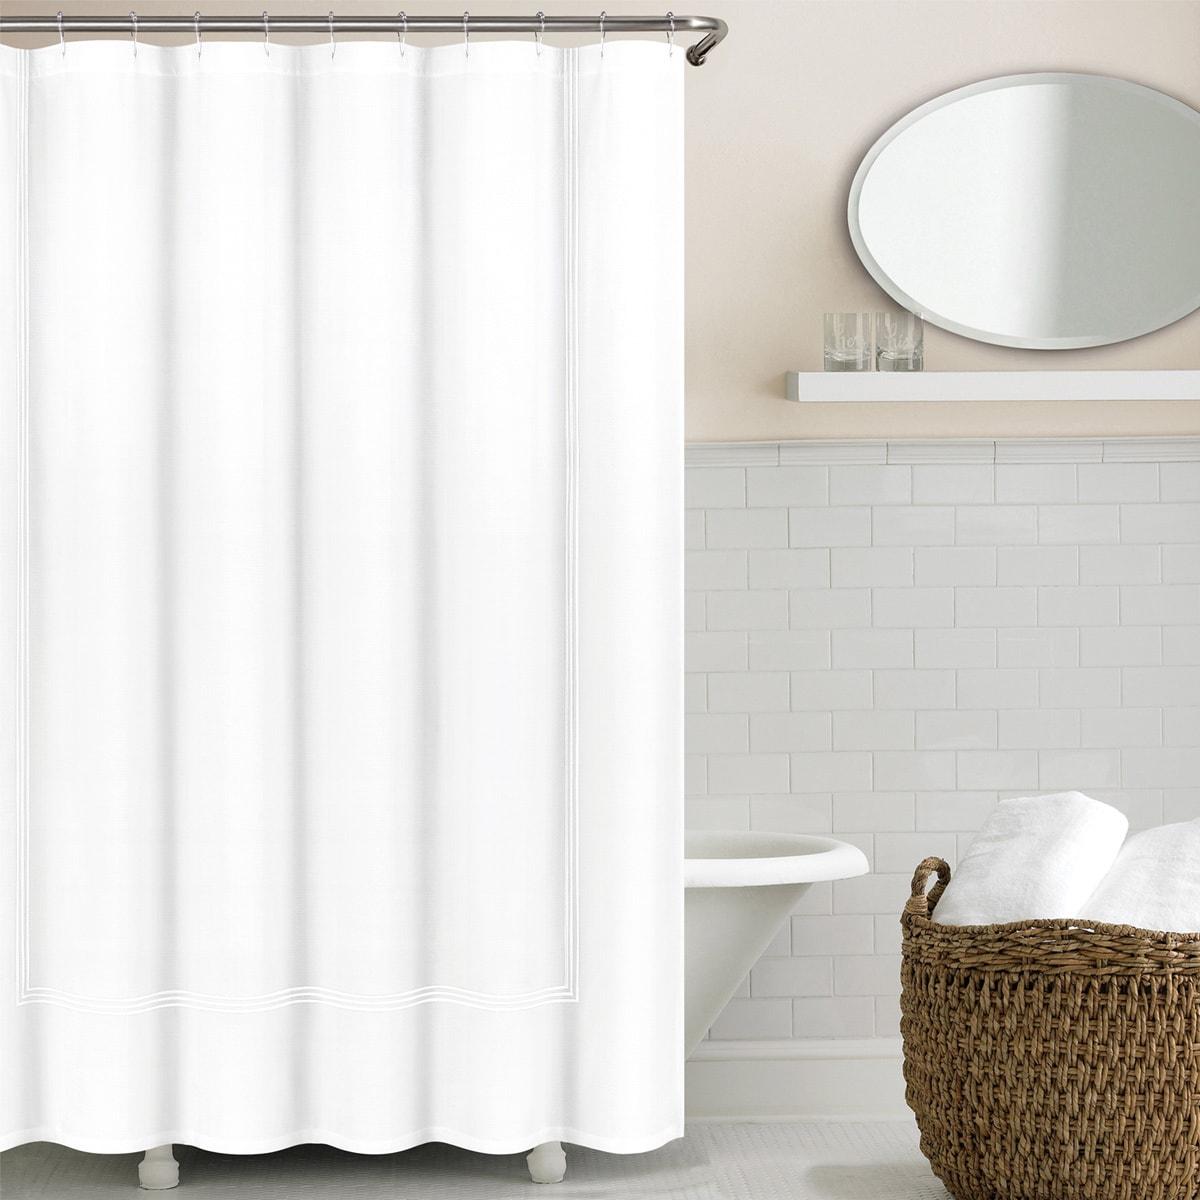 Echelon Home Three Line Hotel Collection Matelasse Shower Curtain